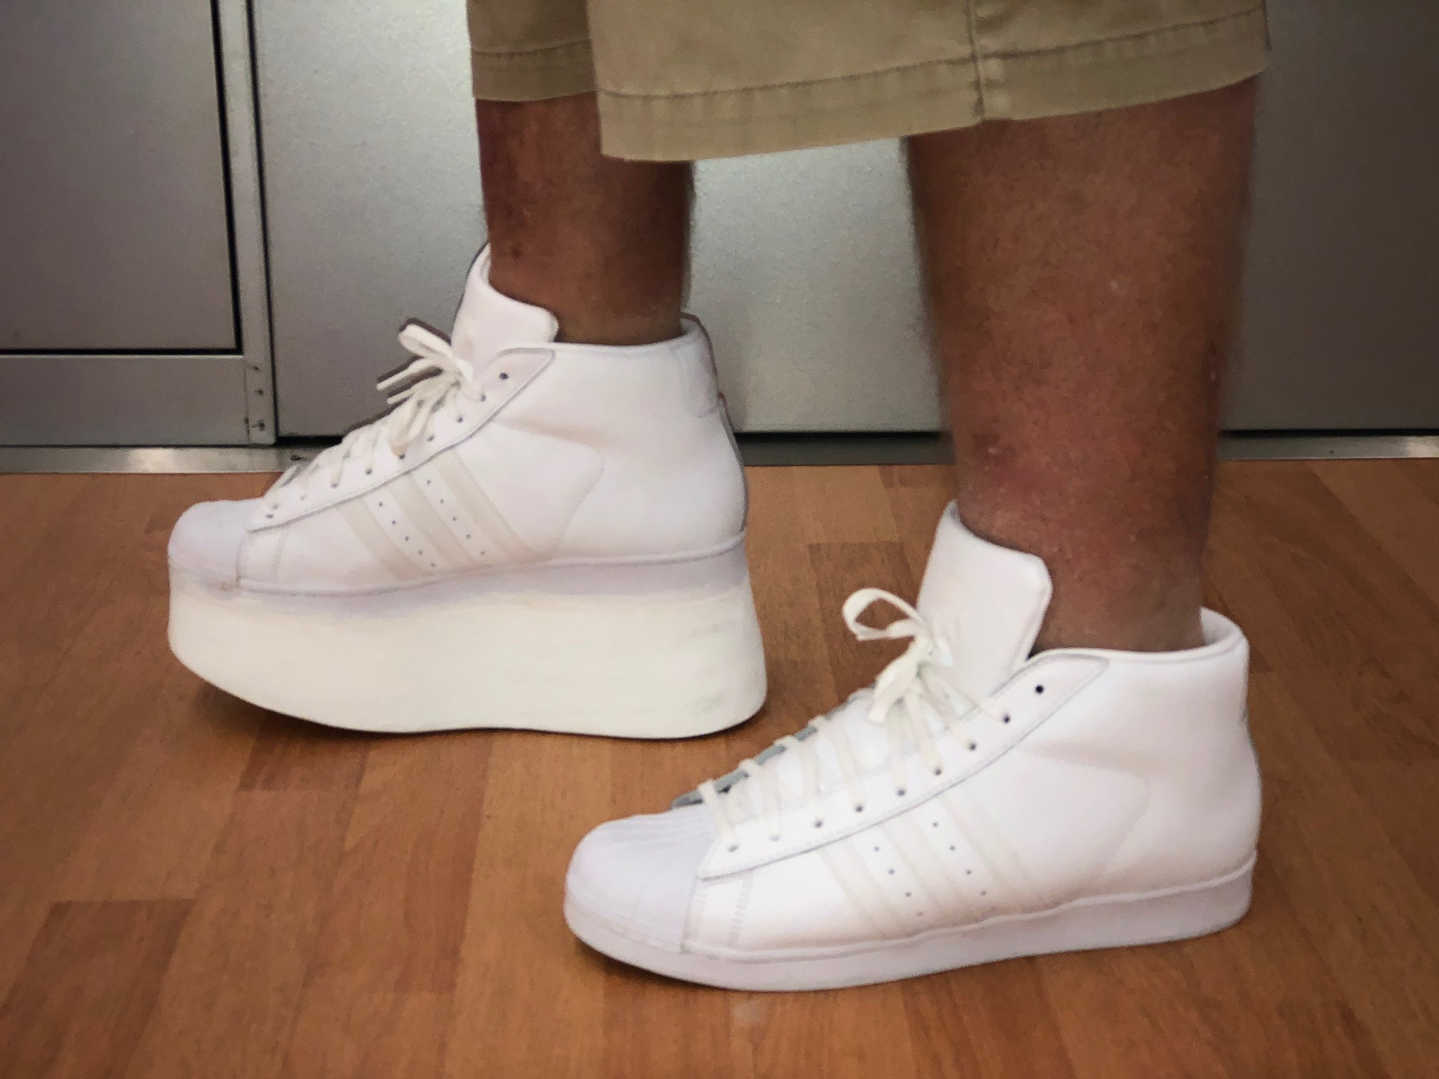 Leg Length Discrepancy Shoe Build-up